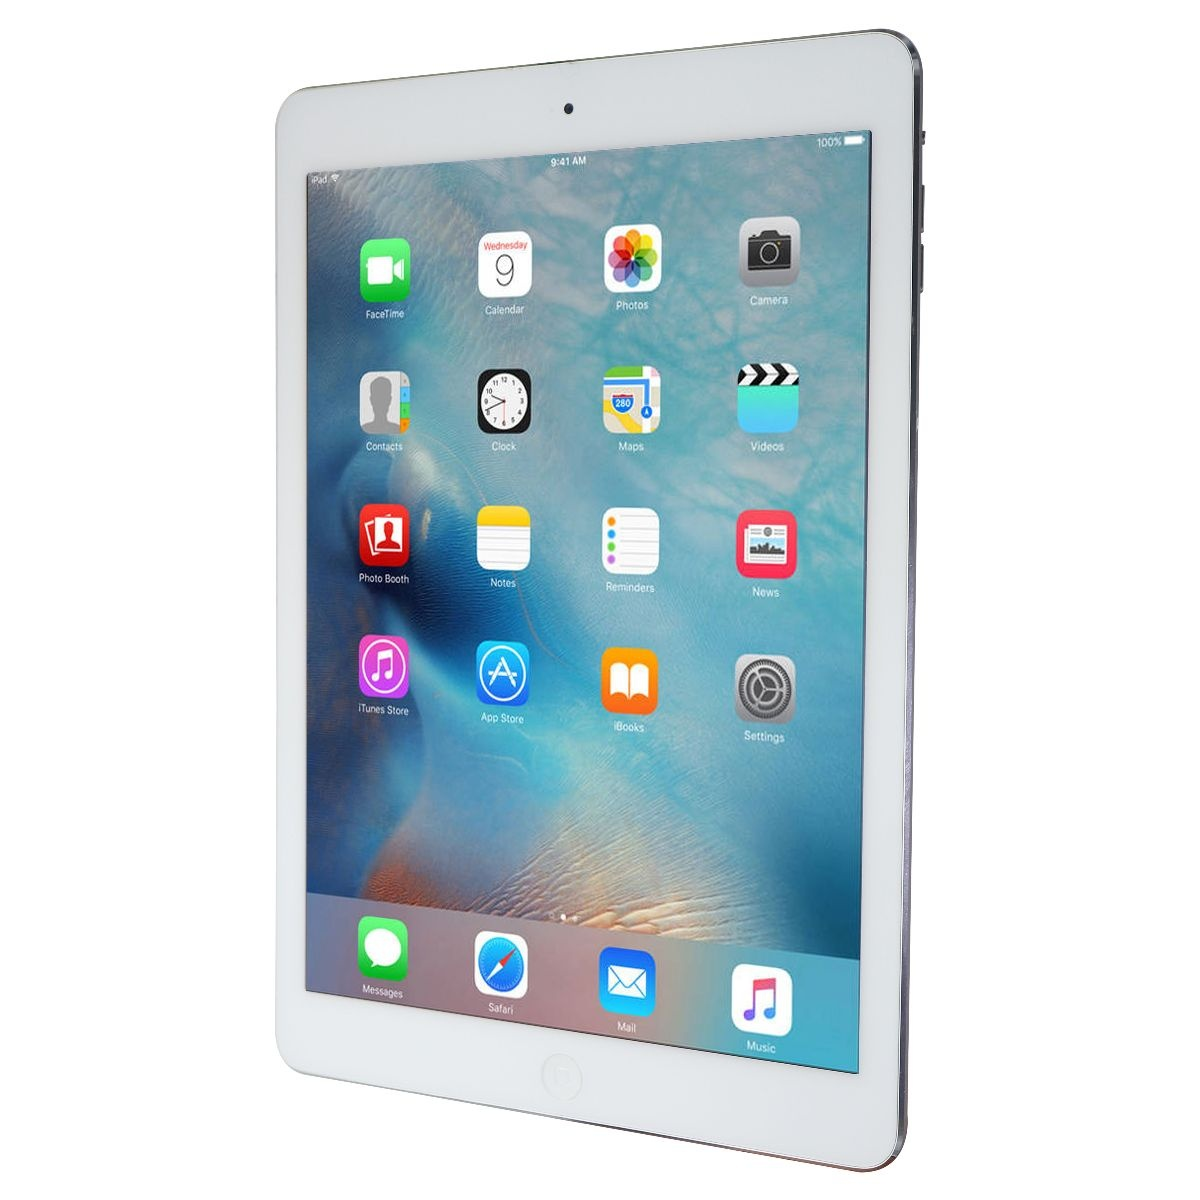 Apple iPad Air 9.7 (1st Gen) A1474 (MD788LL/B) Wi-Fi Only - 16GB / Silver